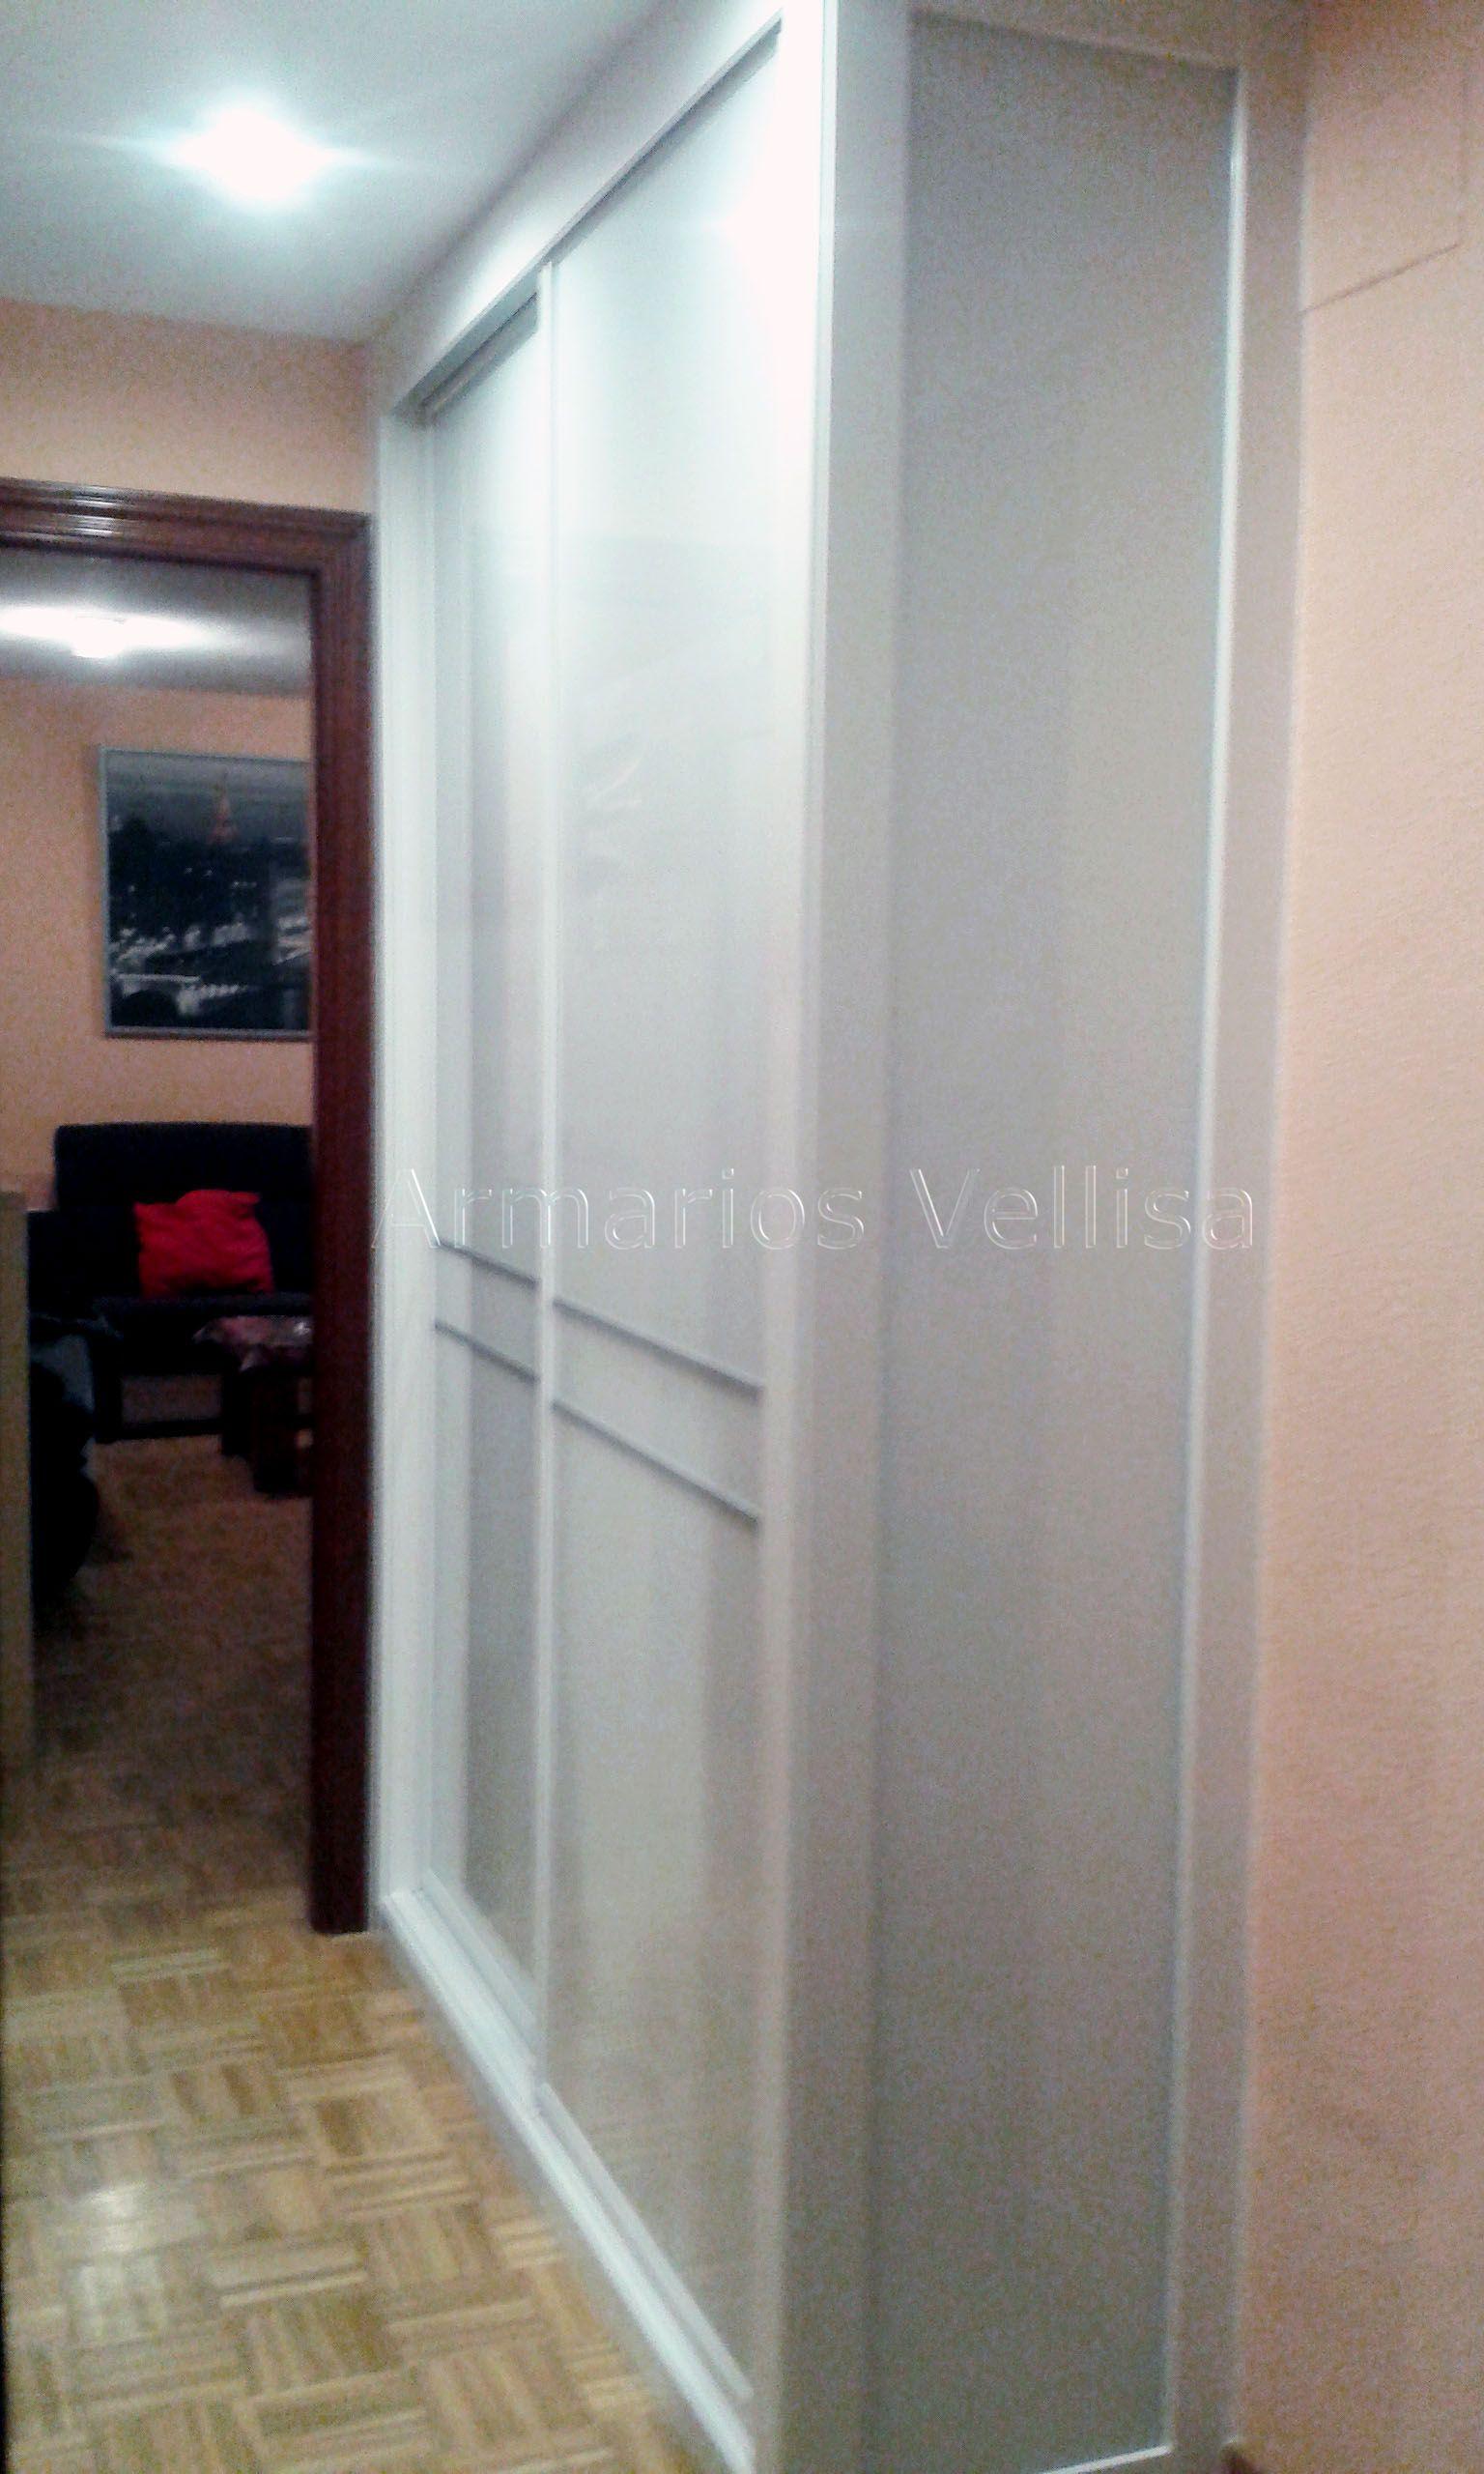 armario de pared con entrada equipada armario empotrado en pasillo entrada vivienda 235 x 170 x